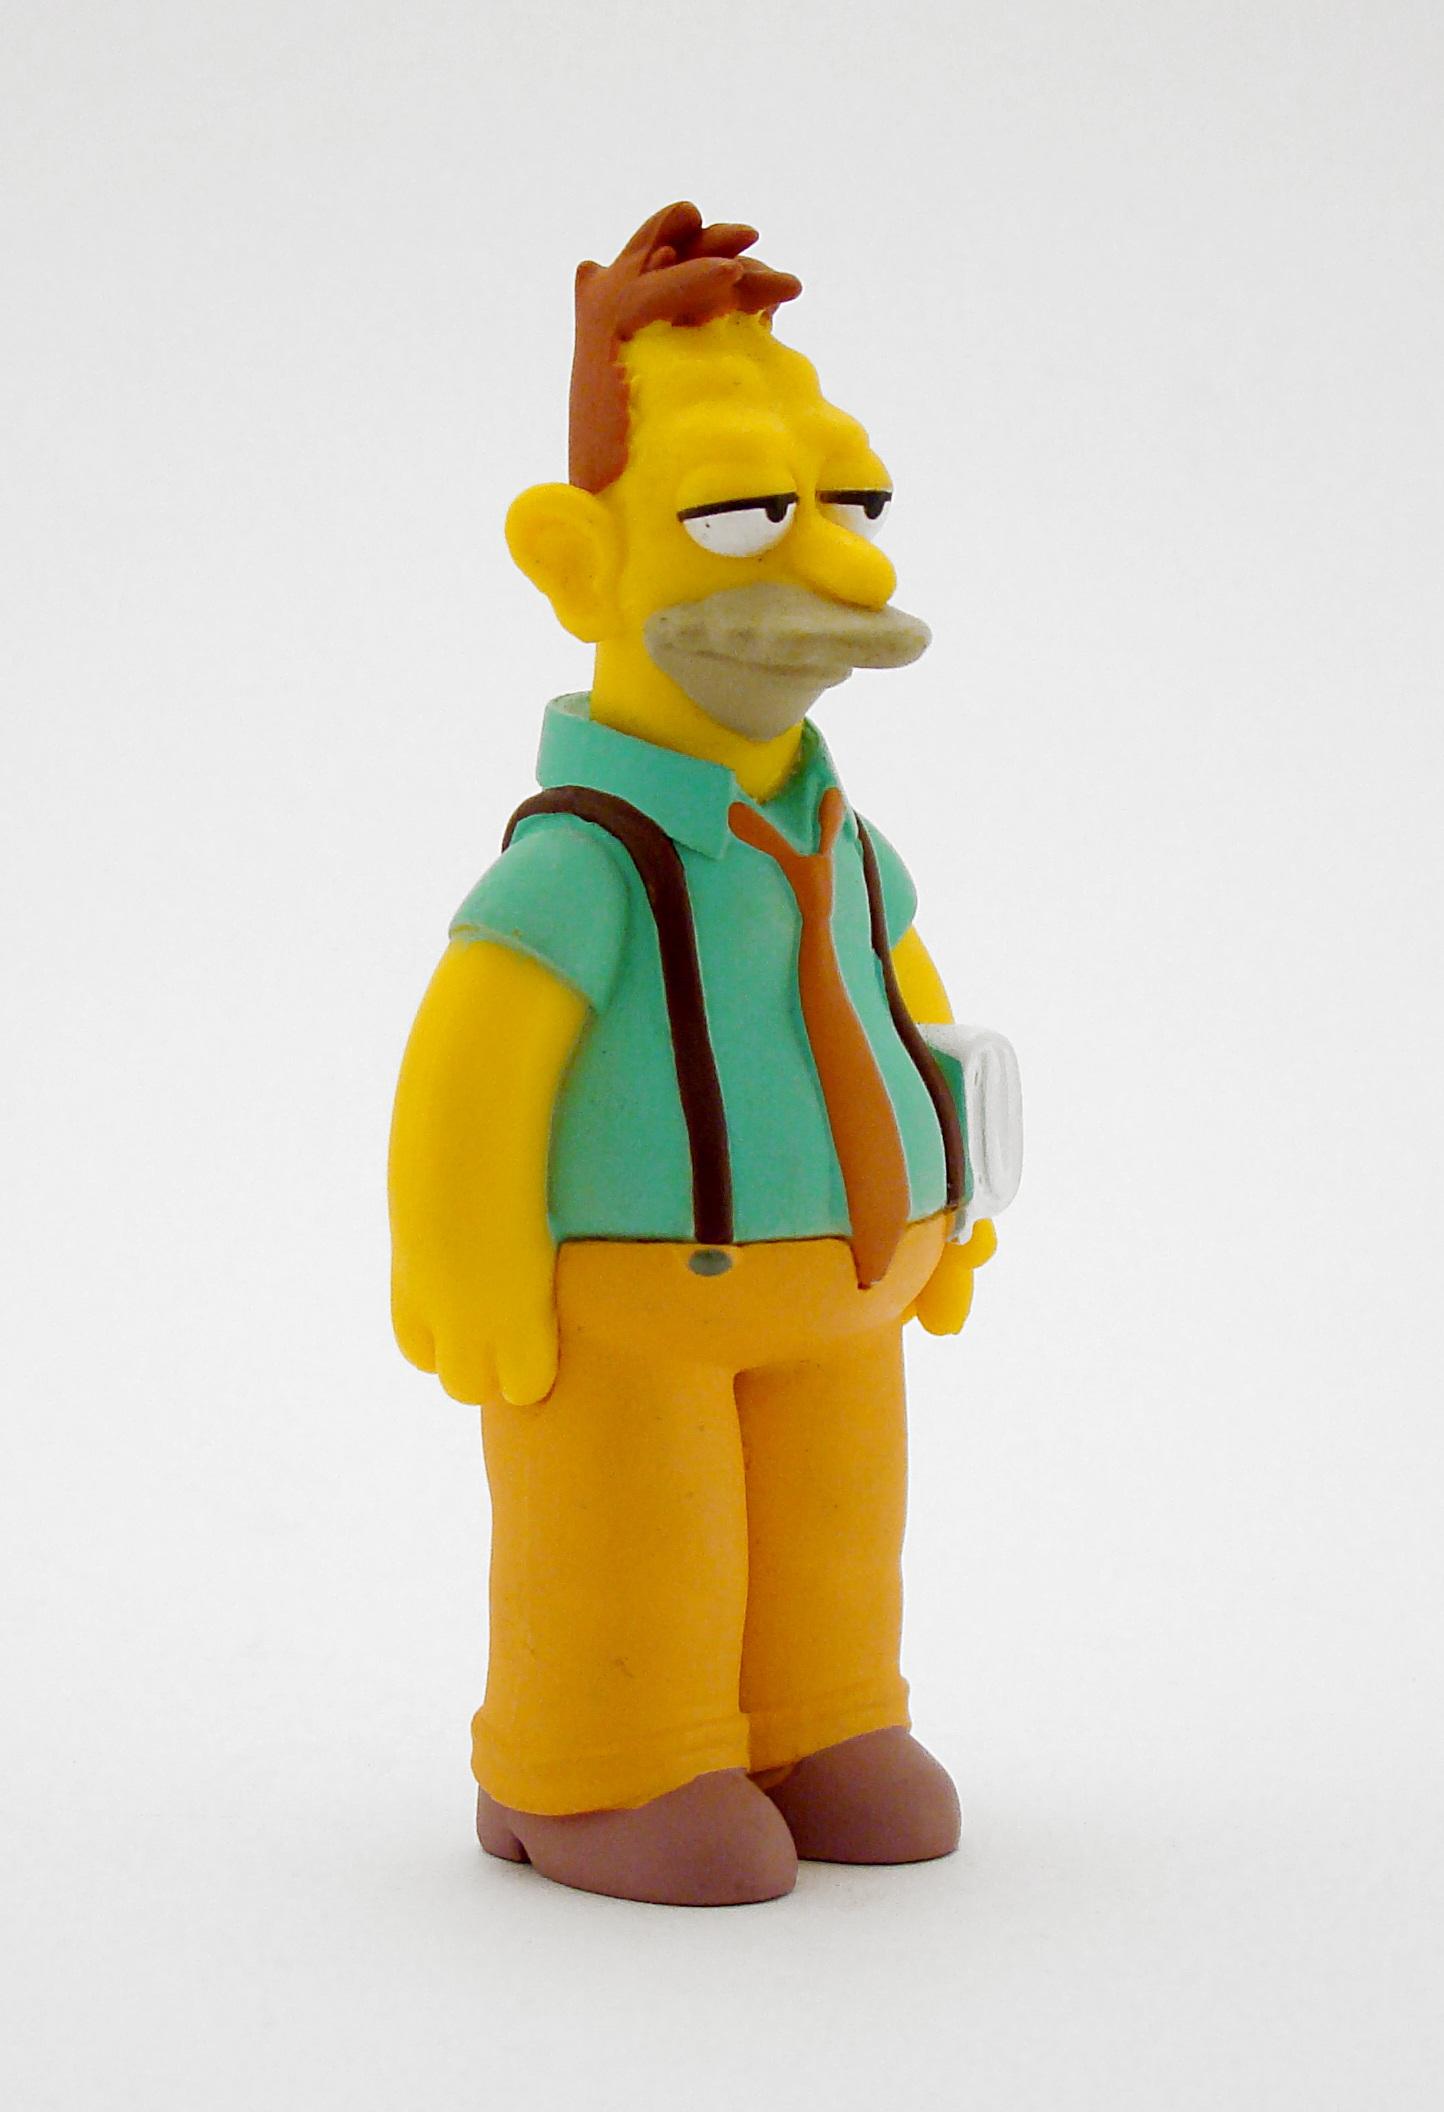 Gambar Simpsons Karakter Mainan Orang Orangan Salju Gambar